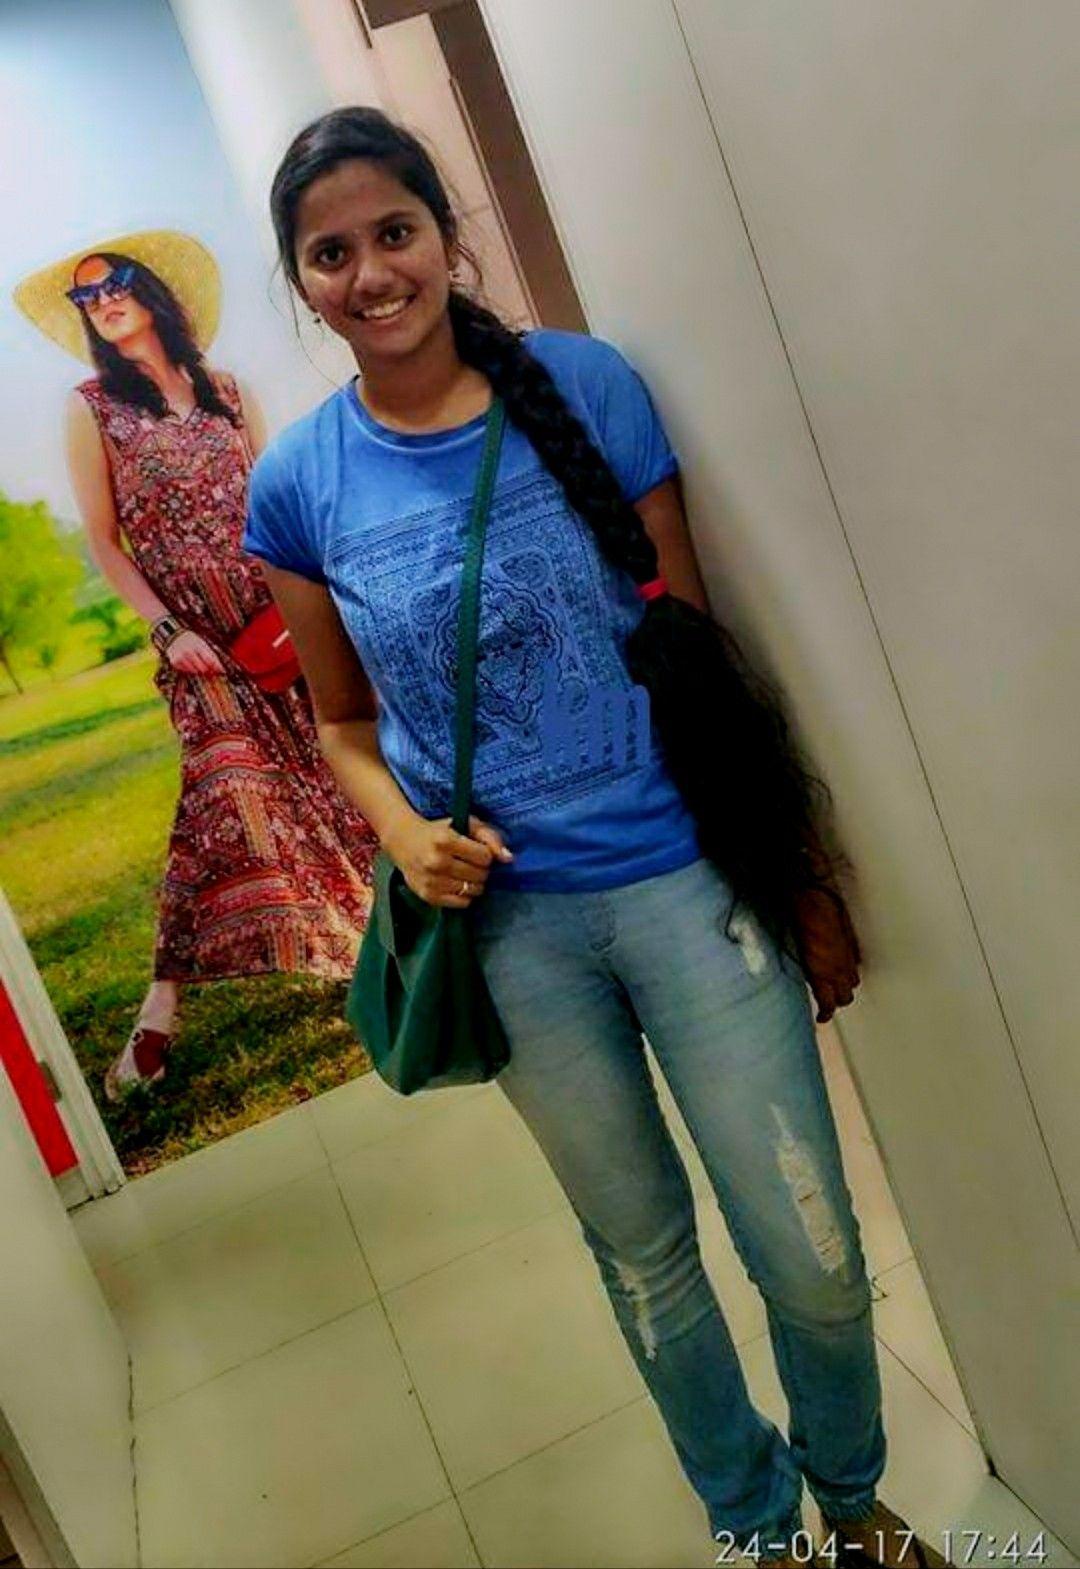 Tamil Girl In Modern Dress T Shirt Short Haircut Styles Haircut Styles For Women Long Hair Styles